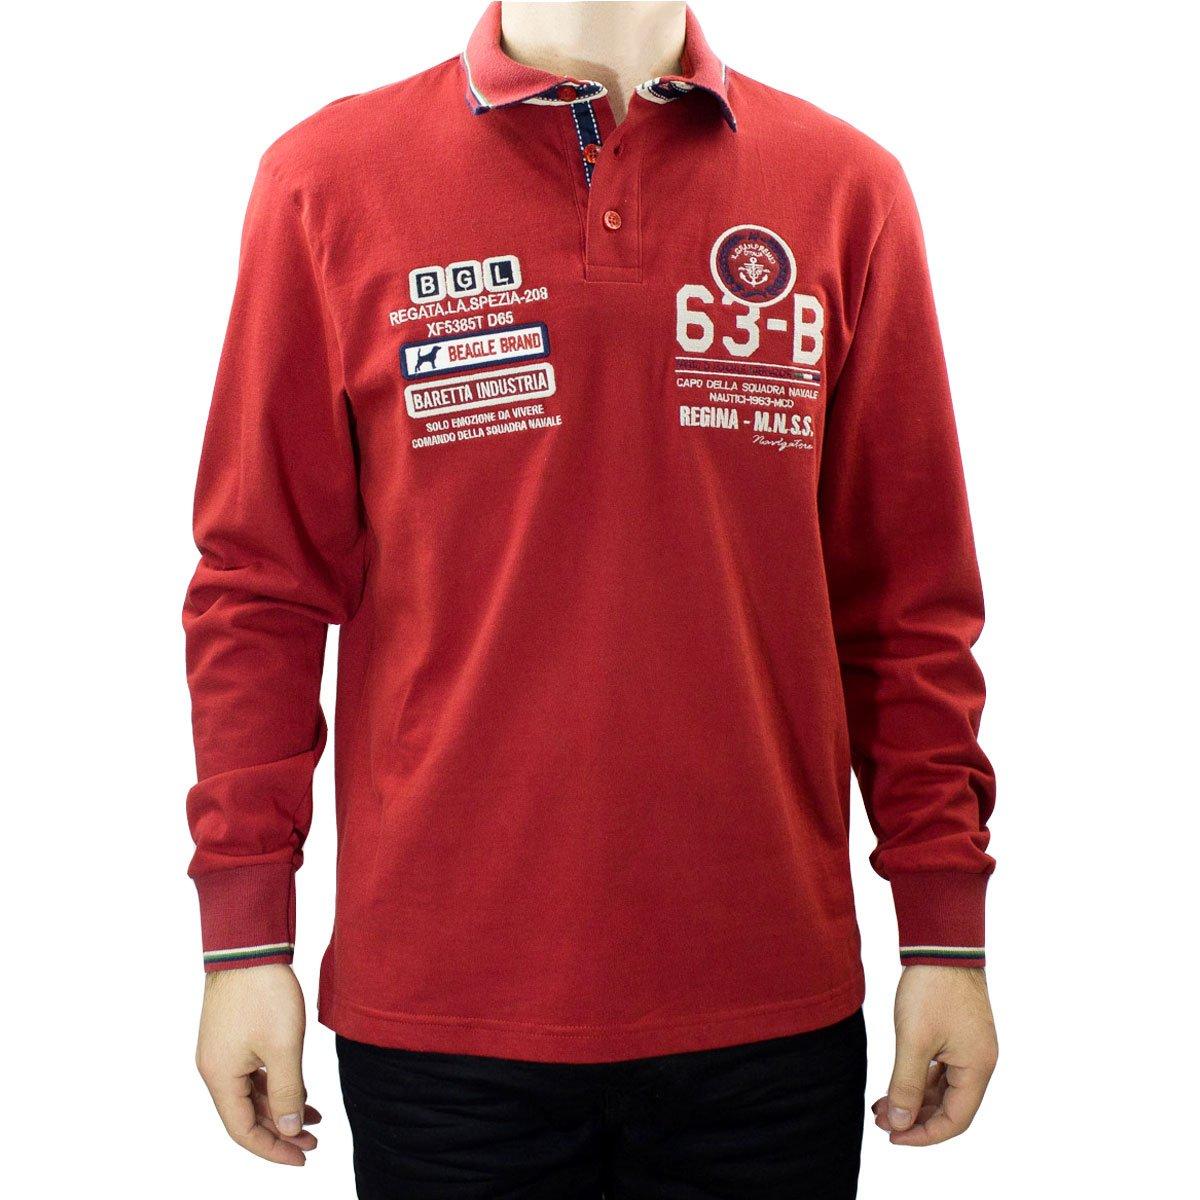 Imagem - Camisa Polo Masculina Beagle Manga Longa 026165 - 029682 889797c86cc8f